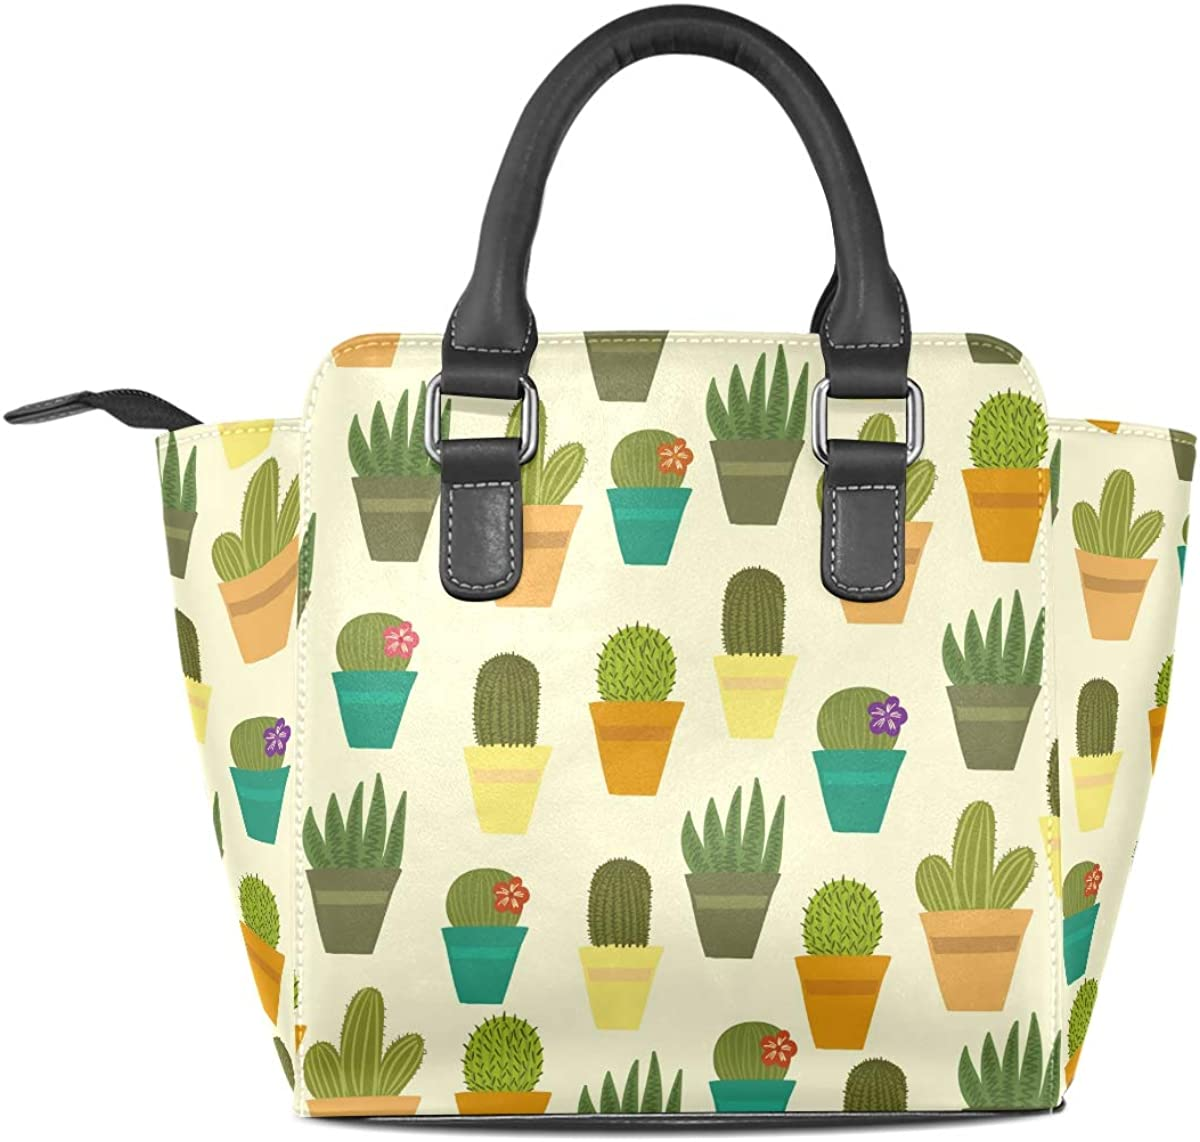 Green Smile Cactus Leather Handbags Purses Shoulder Tote Satchel Bags Womens